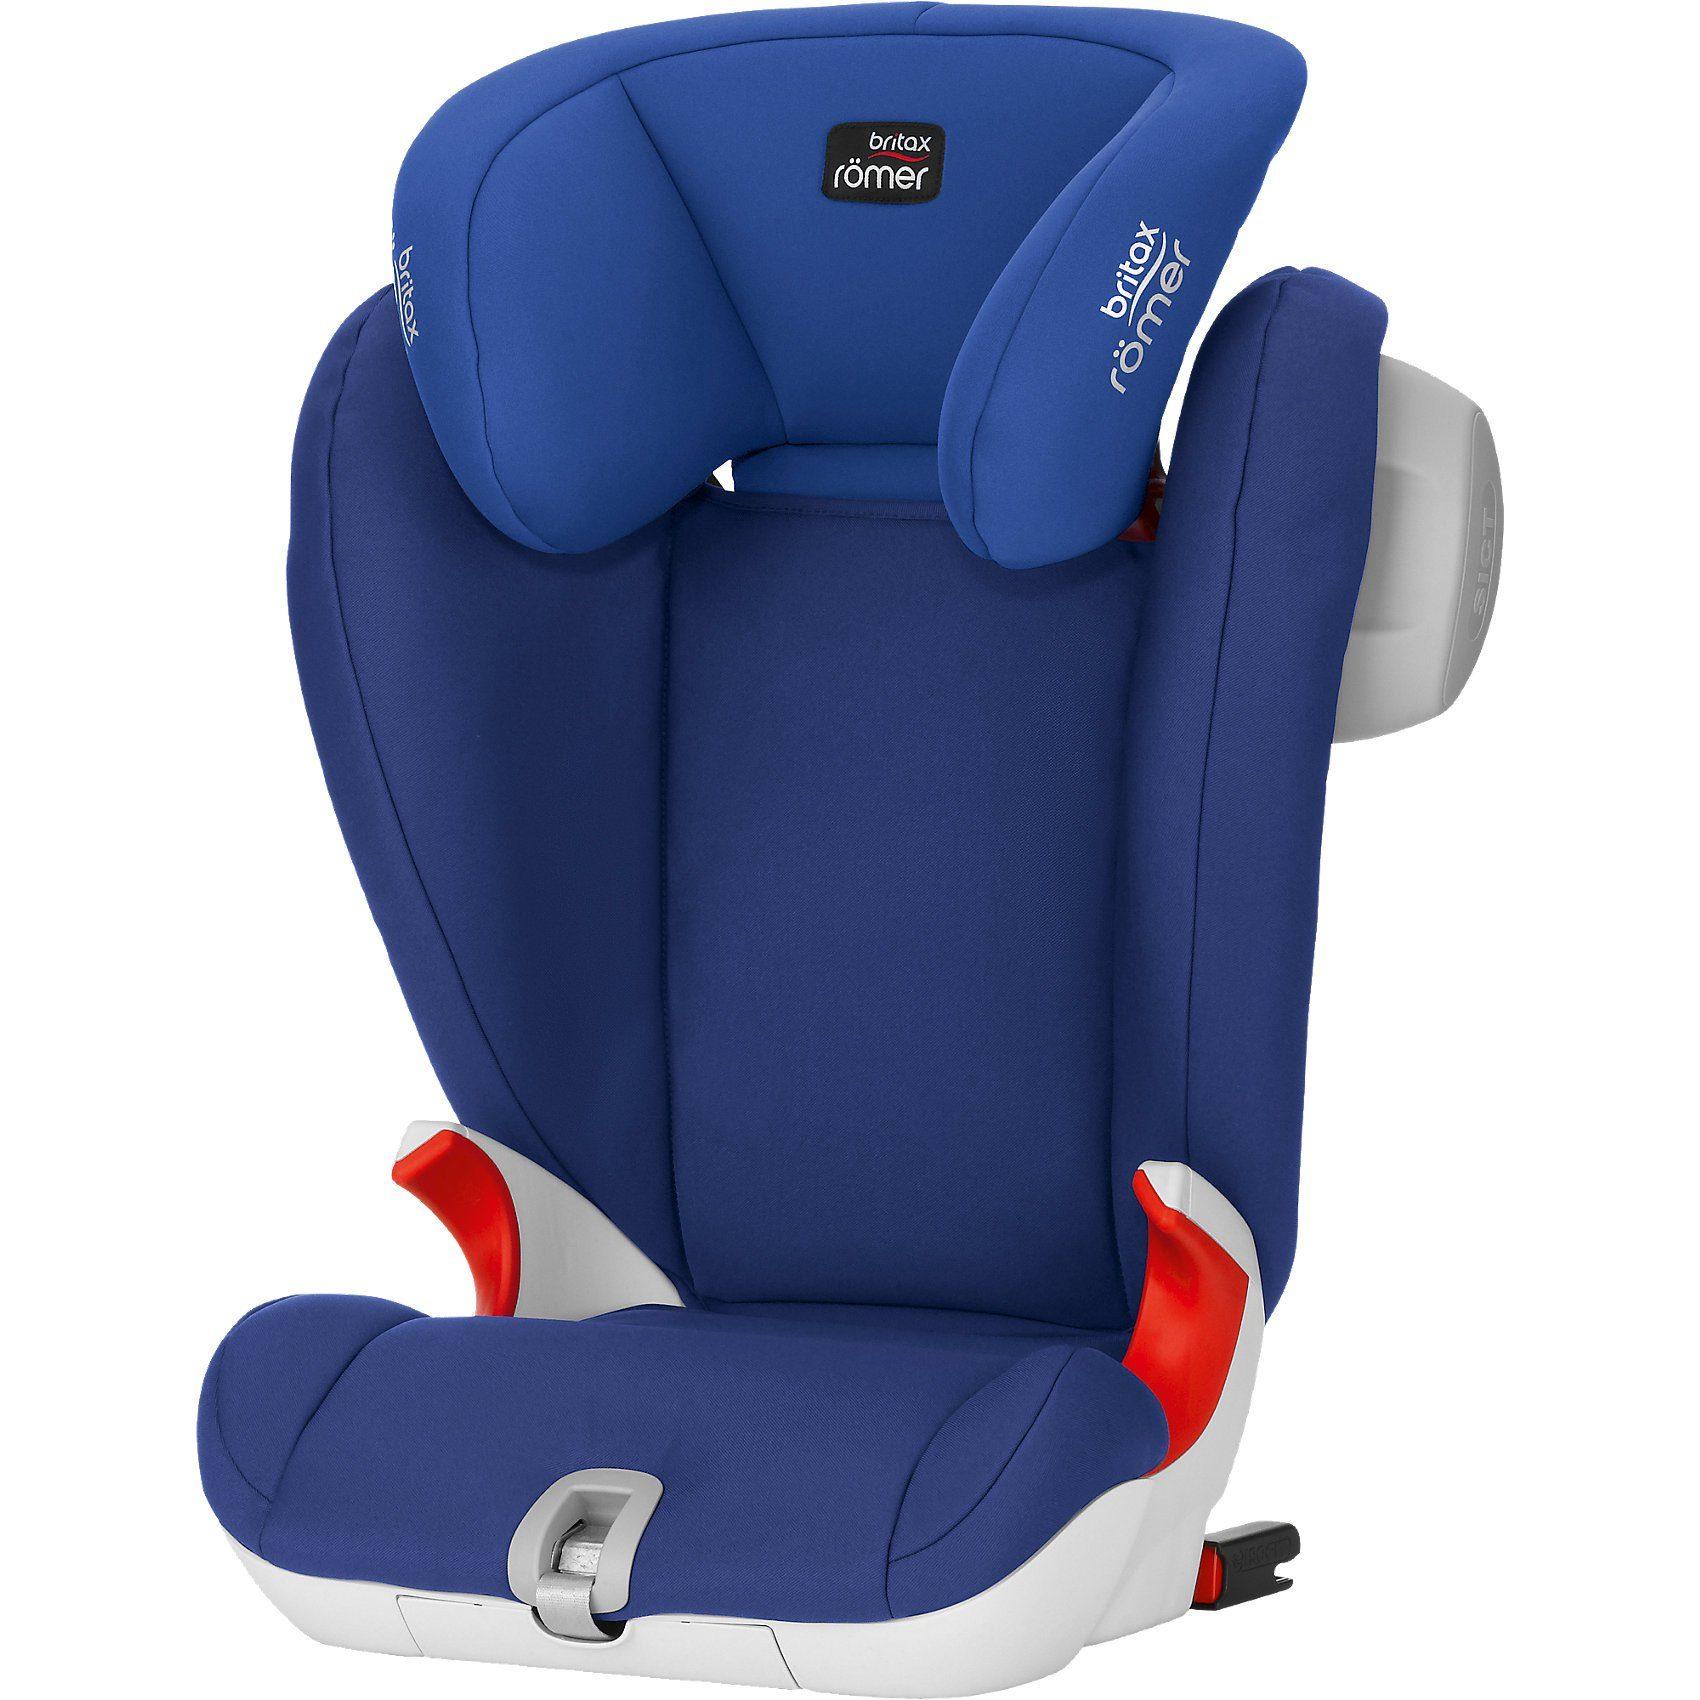 Britax Römer Auto-Kindersitz Kidfix SL Sict, Ocean Blue, 2016